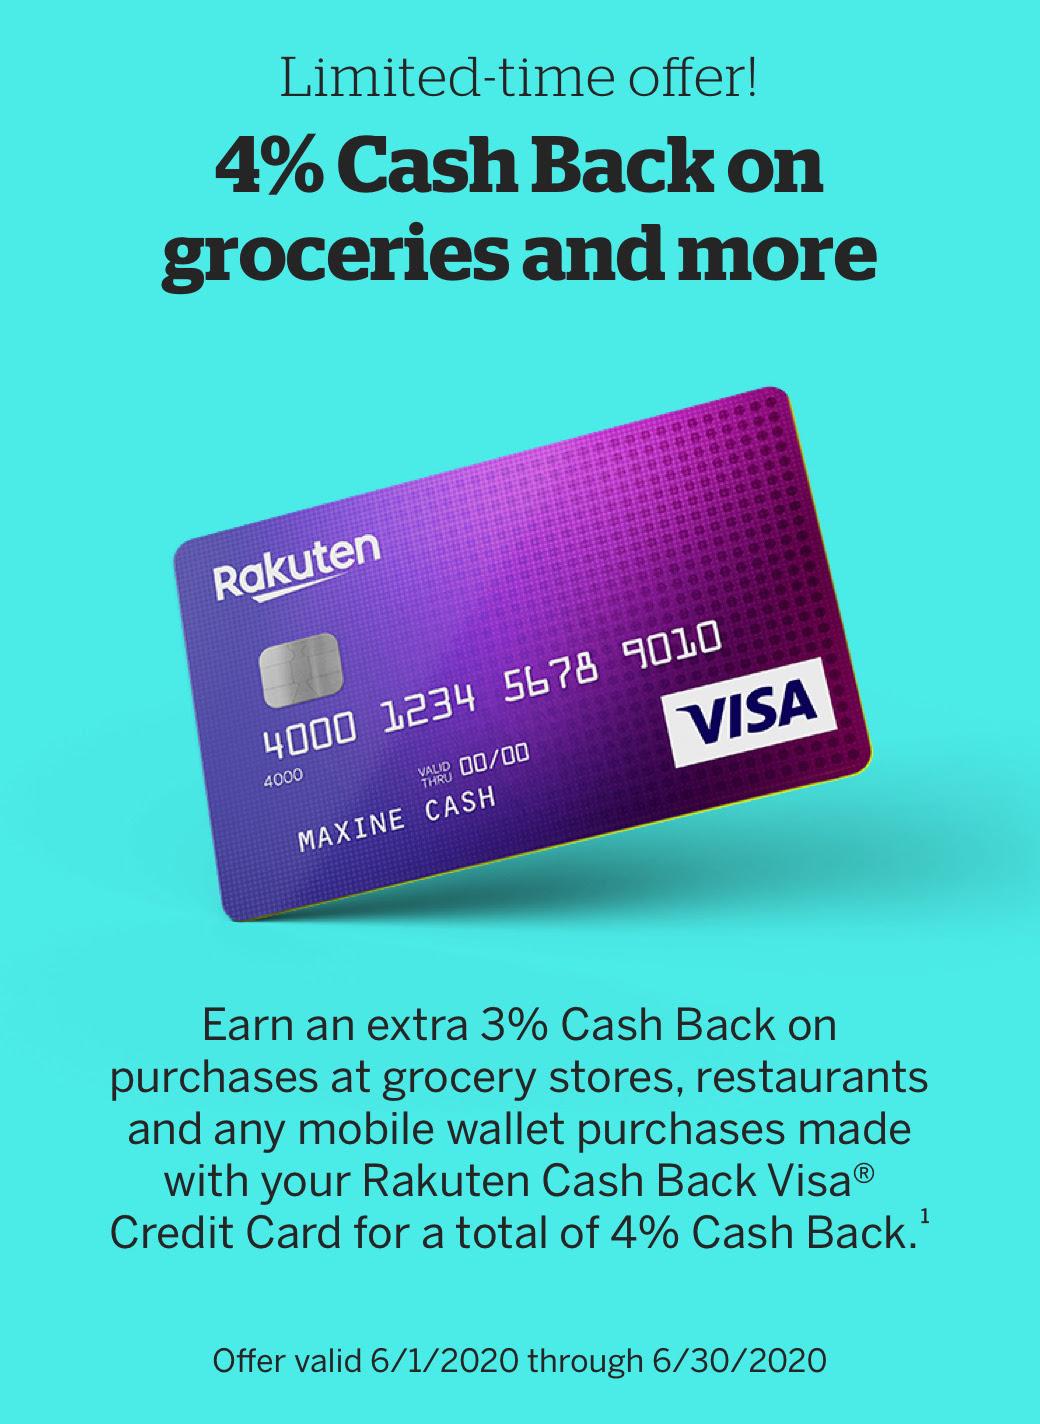 Rakuten Visa Card 12 or 12x MR back on Mobile Wal...   myFICO ...